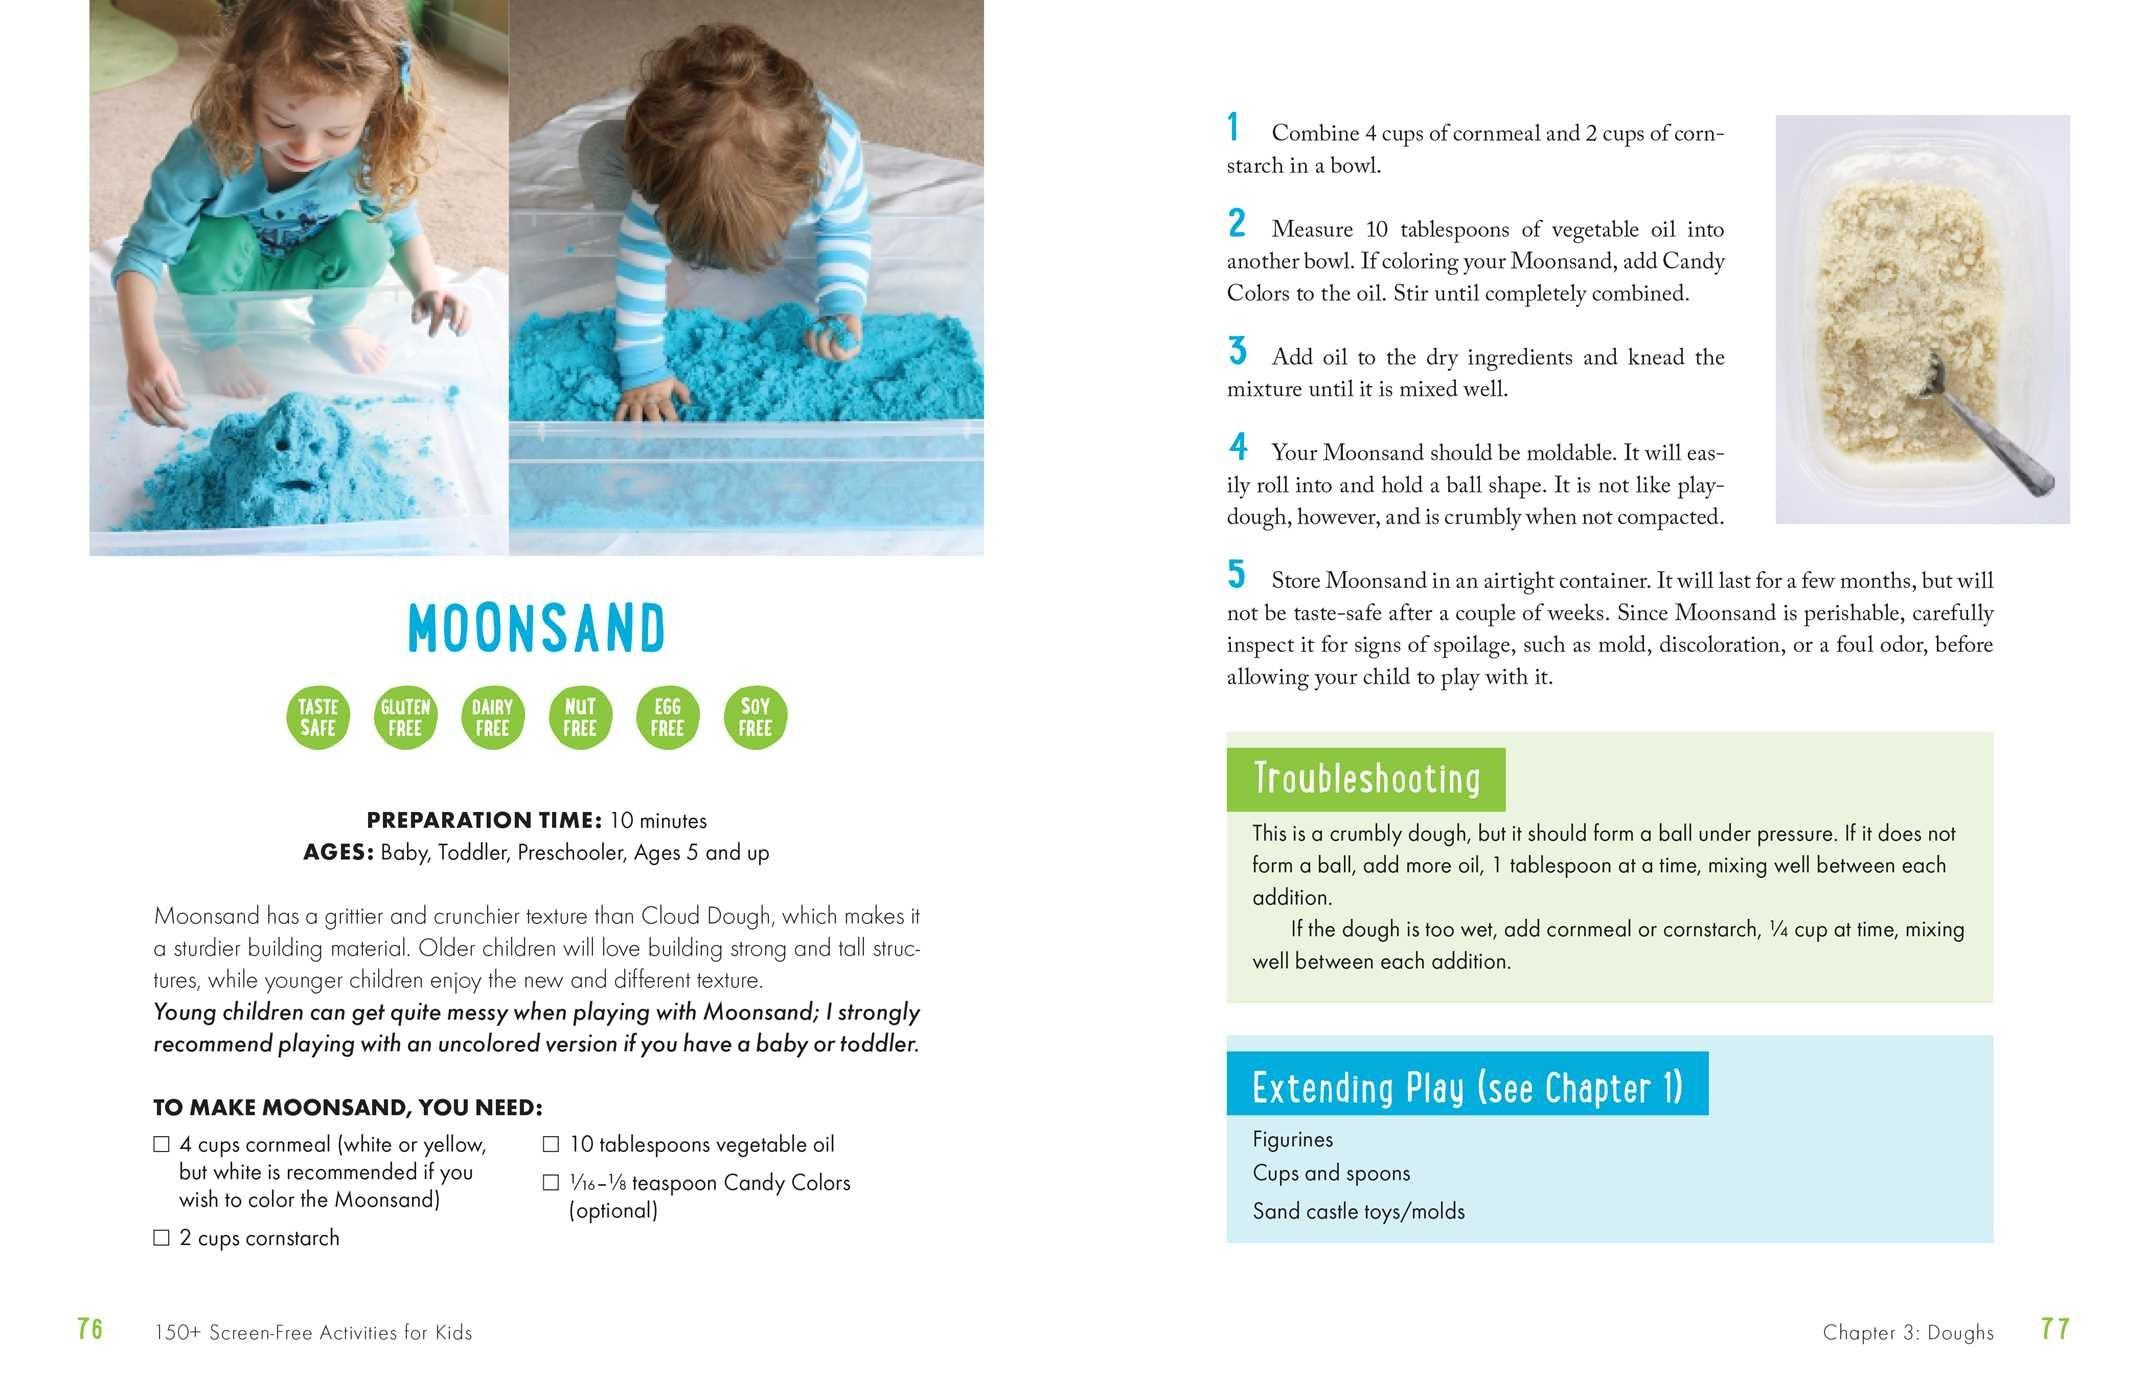 150 screen free activities for kids 9781440576157.in03